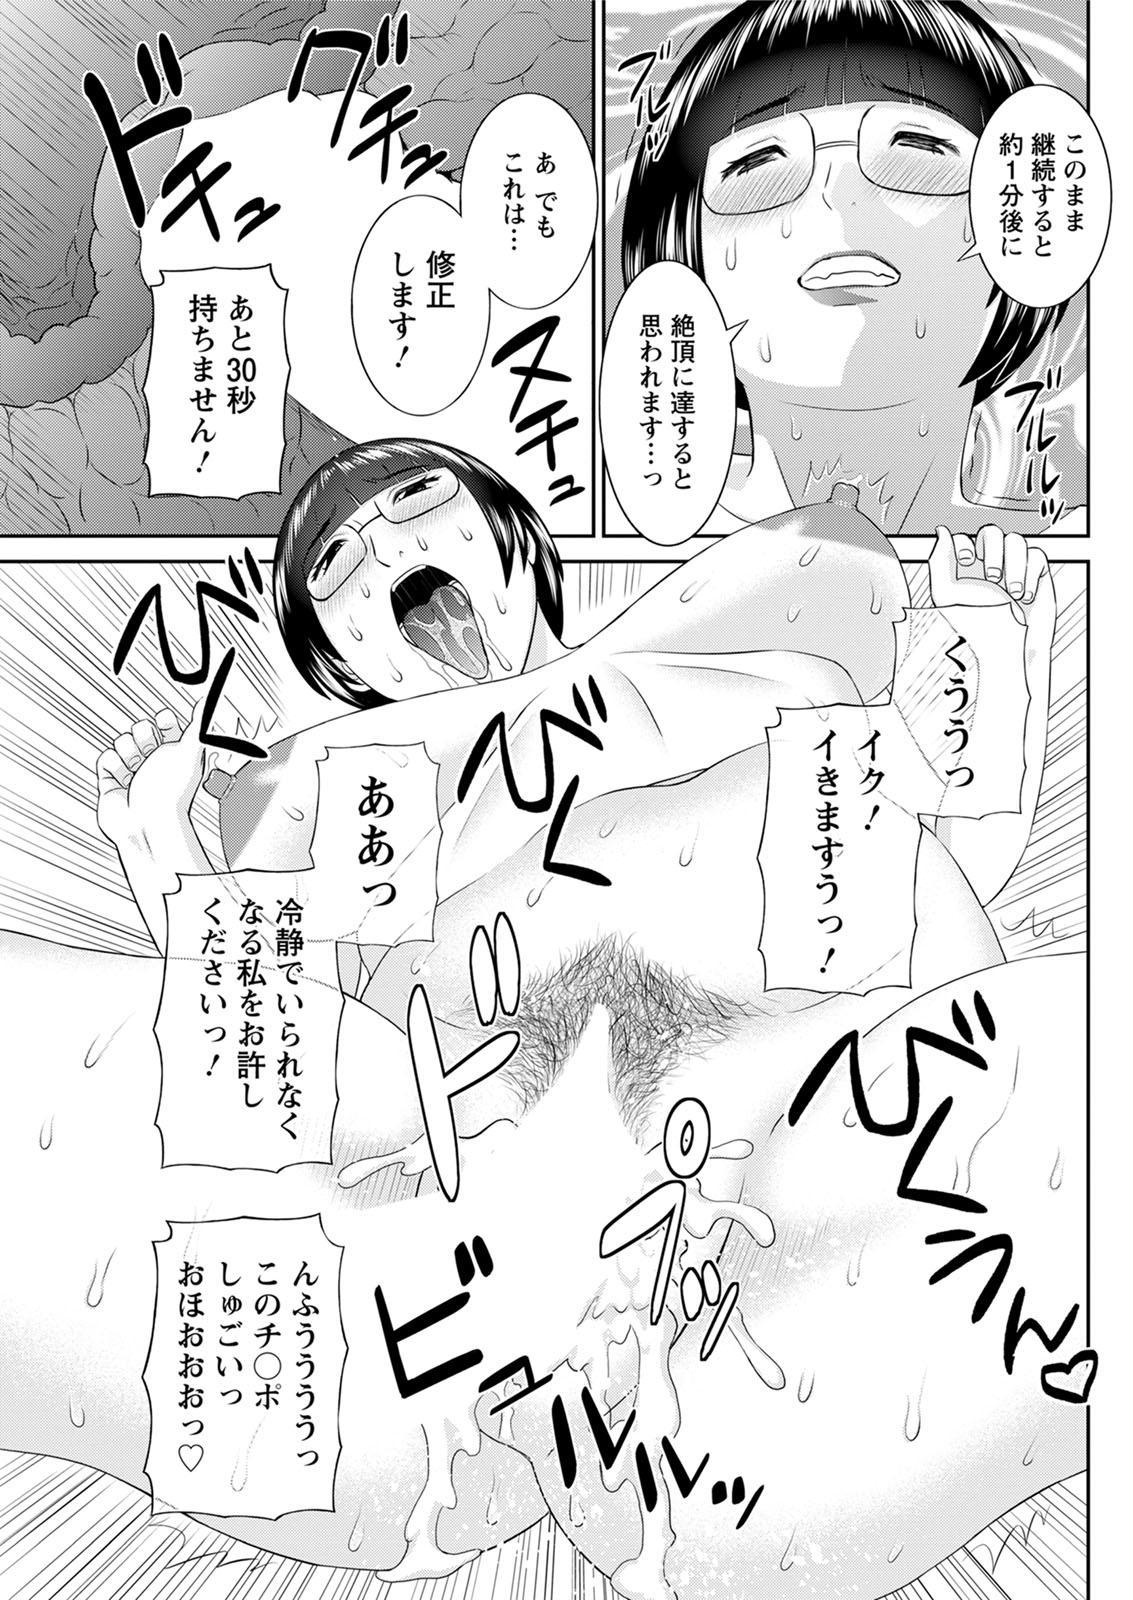 [Kawamori Misaki] Kaikan Hitotsuma Gakuen Ch. 1-6, 8-20 [Digital] 251